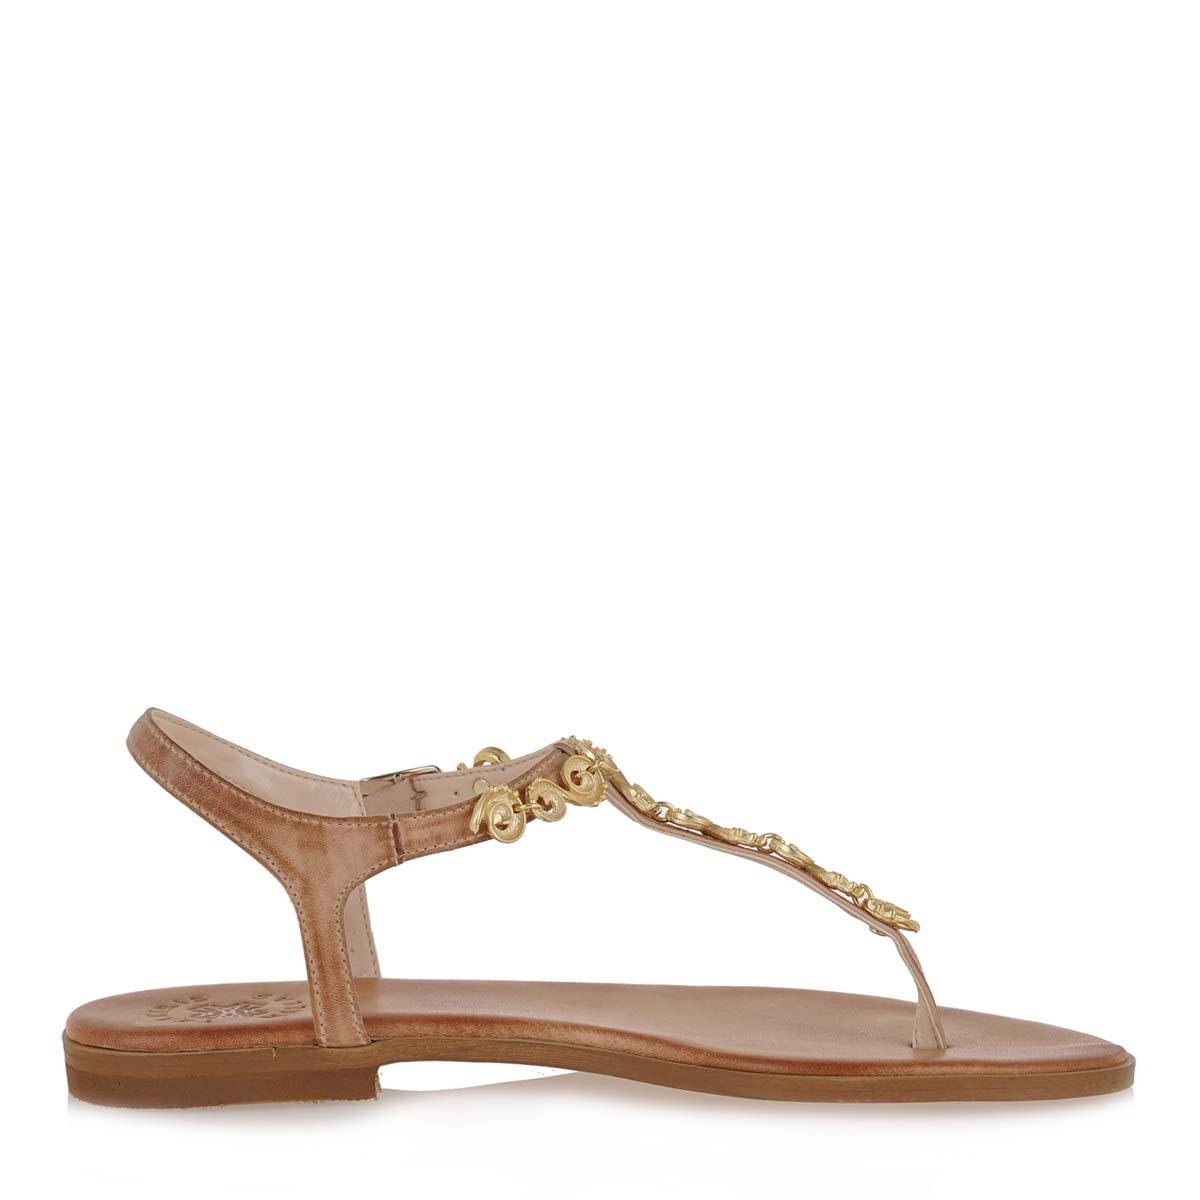 1e47d393dec Γυναικεία παπούτσια FLATS σχέδιο: I453D8731   My Lady Shoes